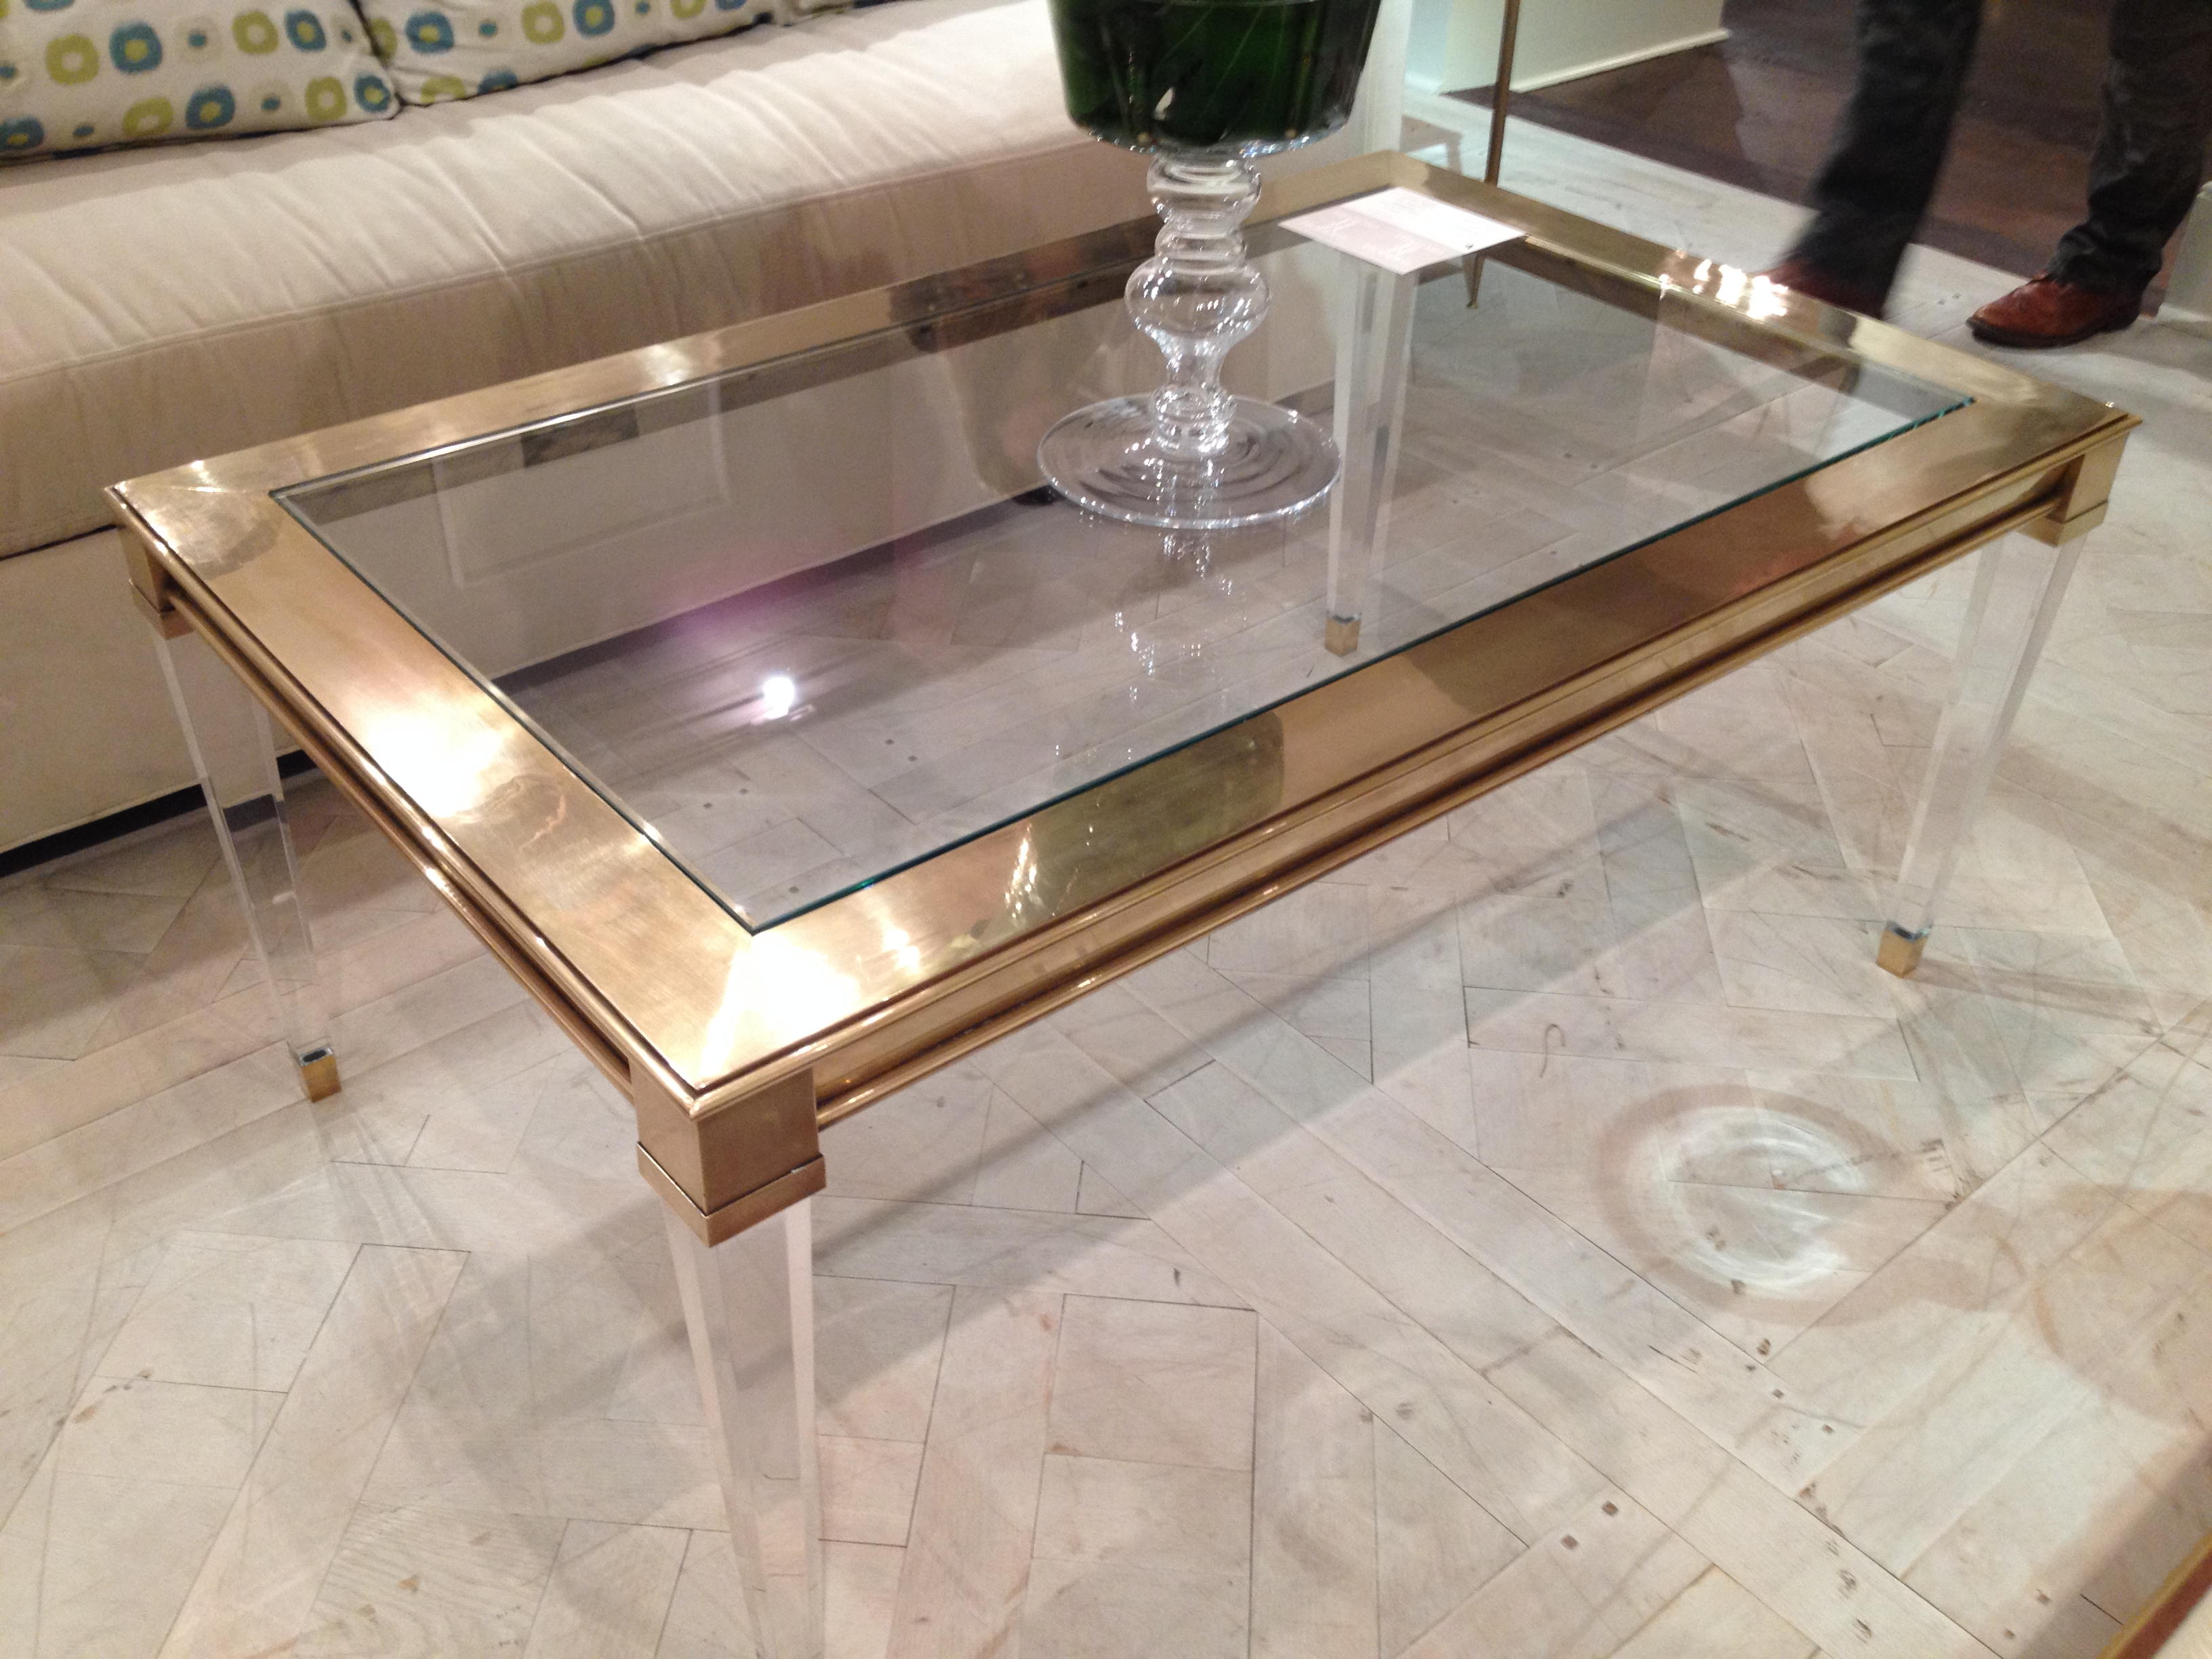 2019 Salma Acrylic And Brass Coffee Table – Mecox Gardens For Acrylic Glass And Brass Coffee Tables (View 6 of 20)